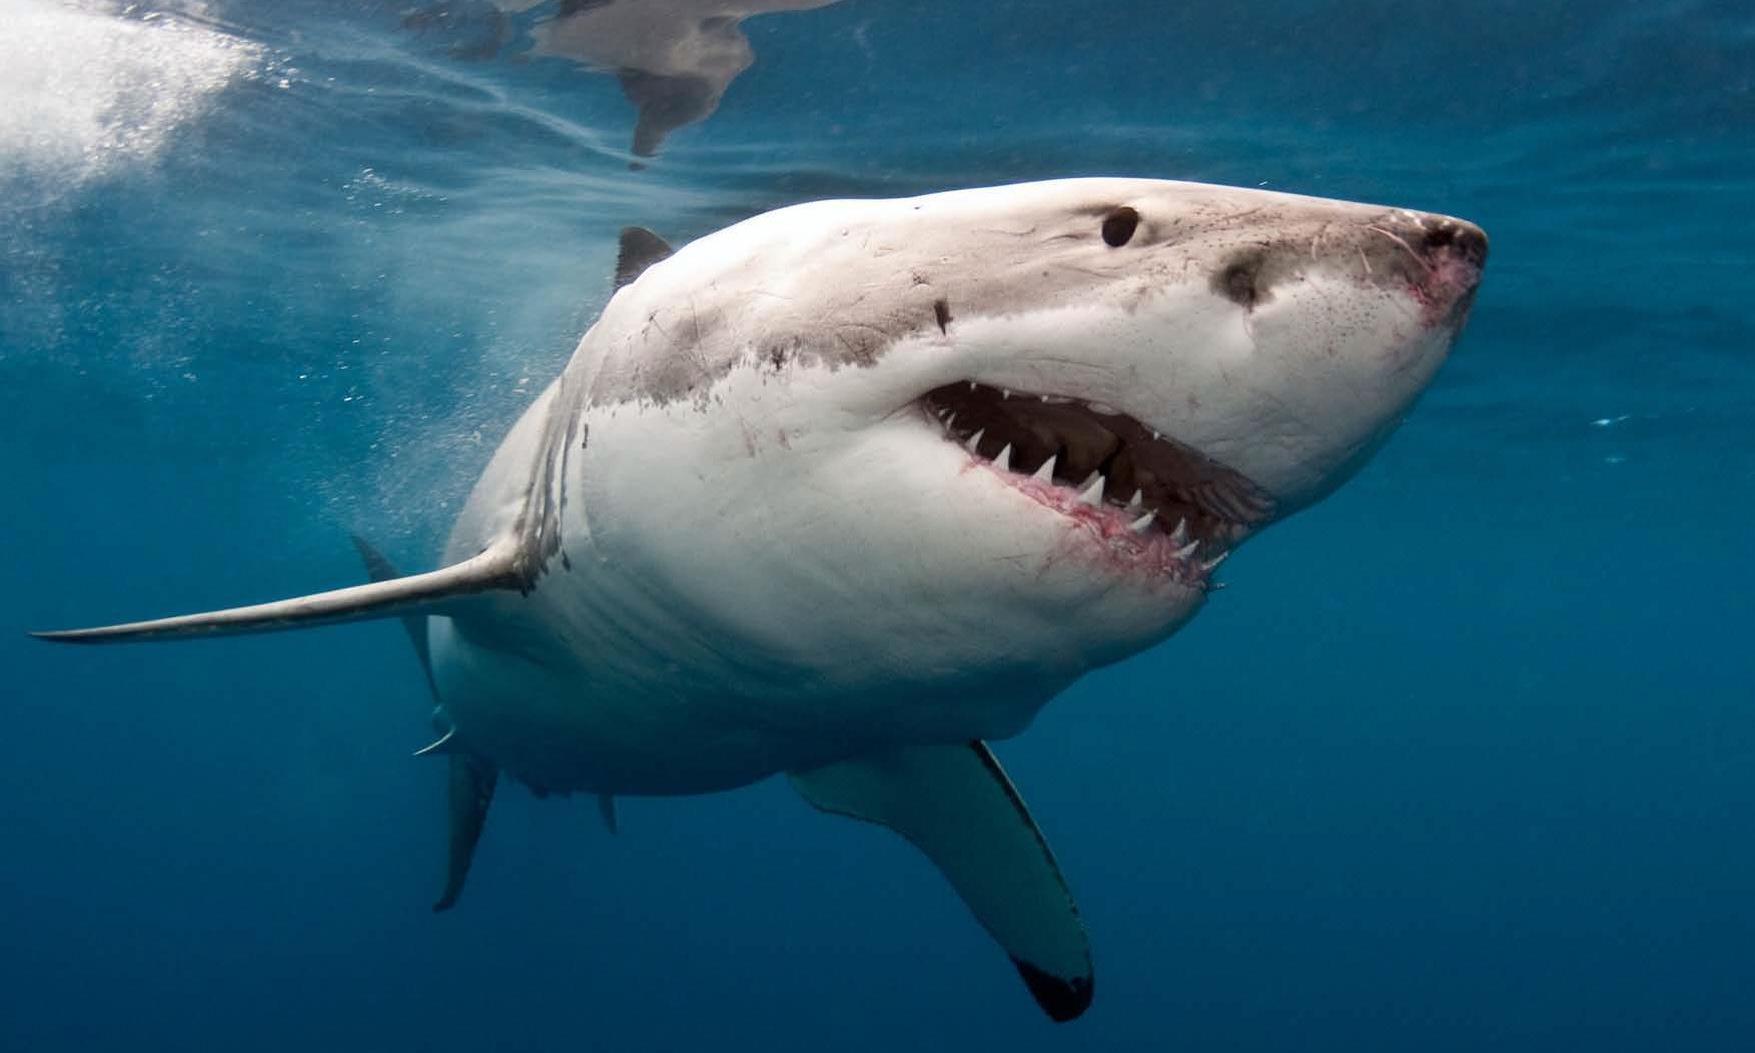 Man bitten on the leg by shark while surfing near Byron Bay